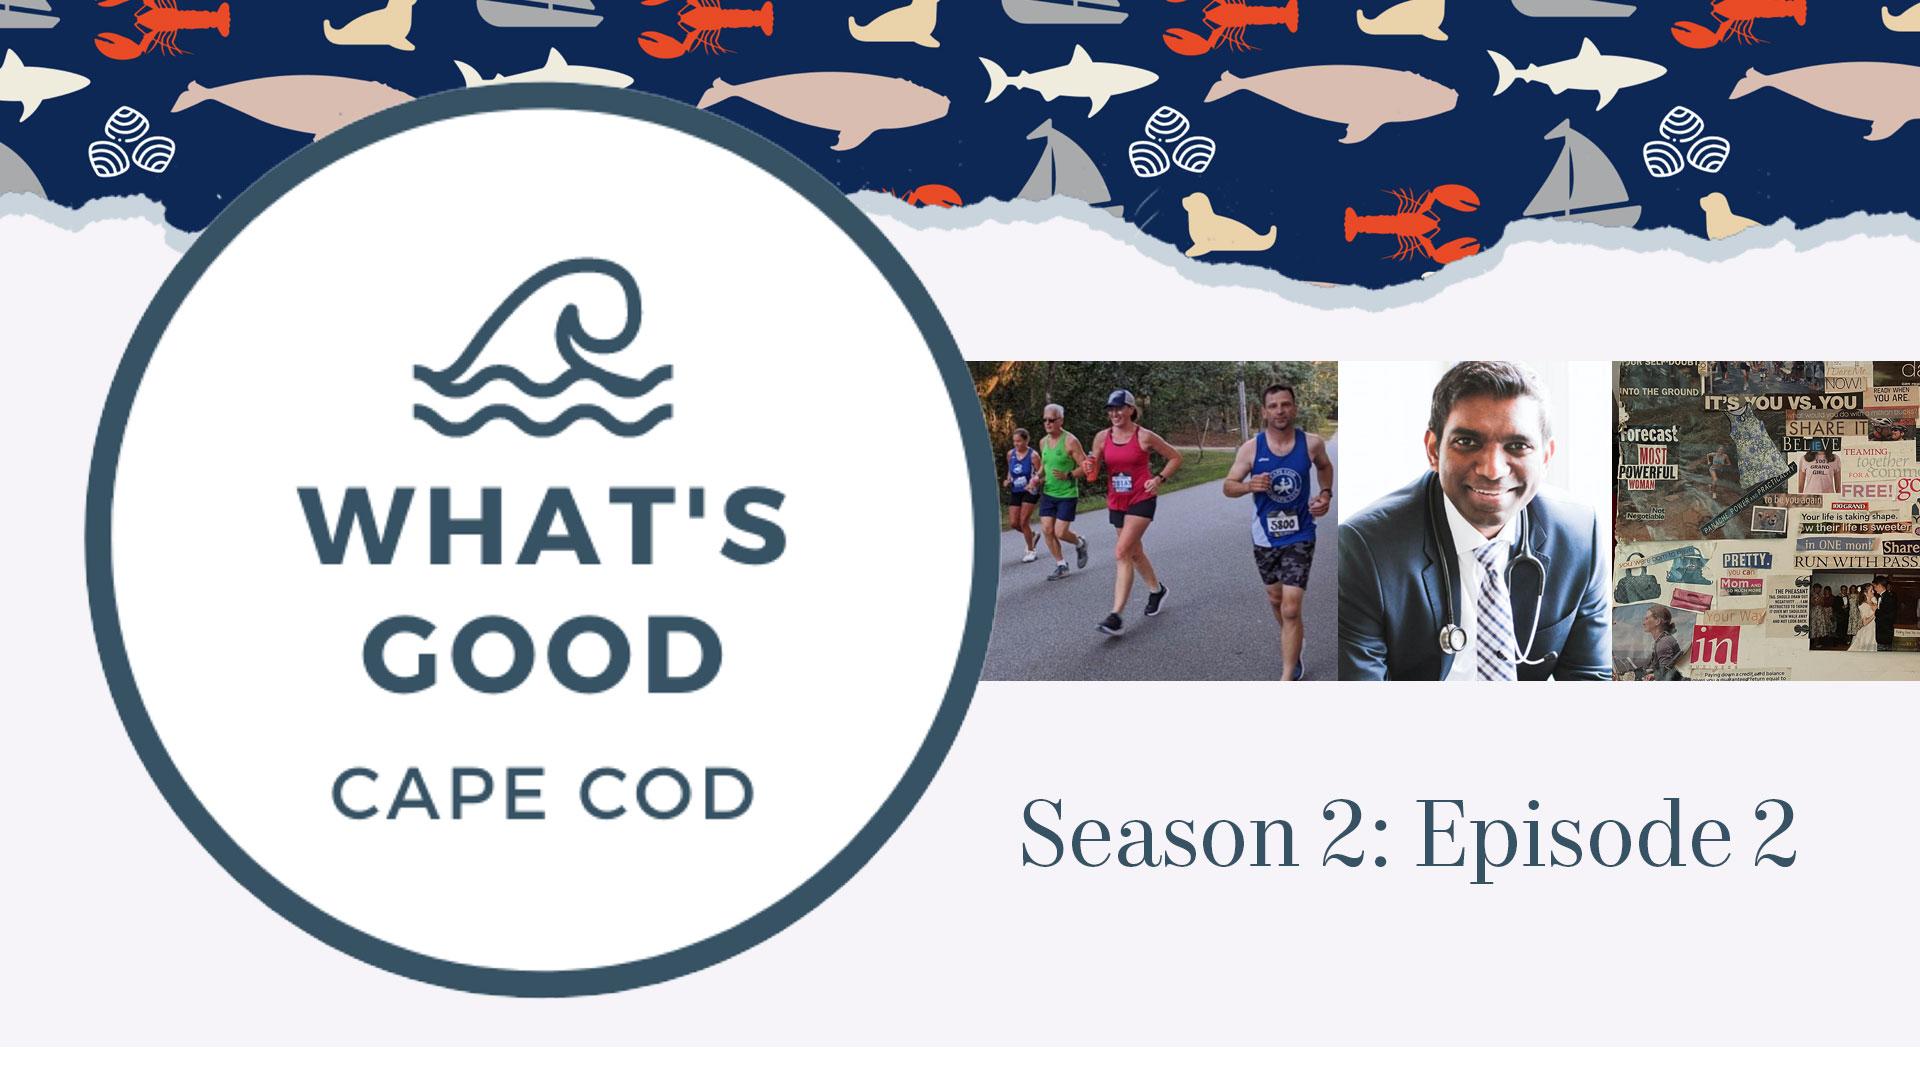 What's Good Cape Cod « Season 2 Episode 2